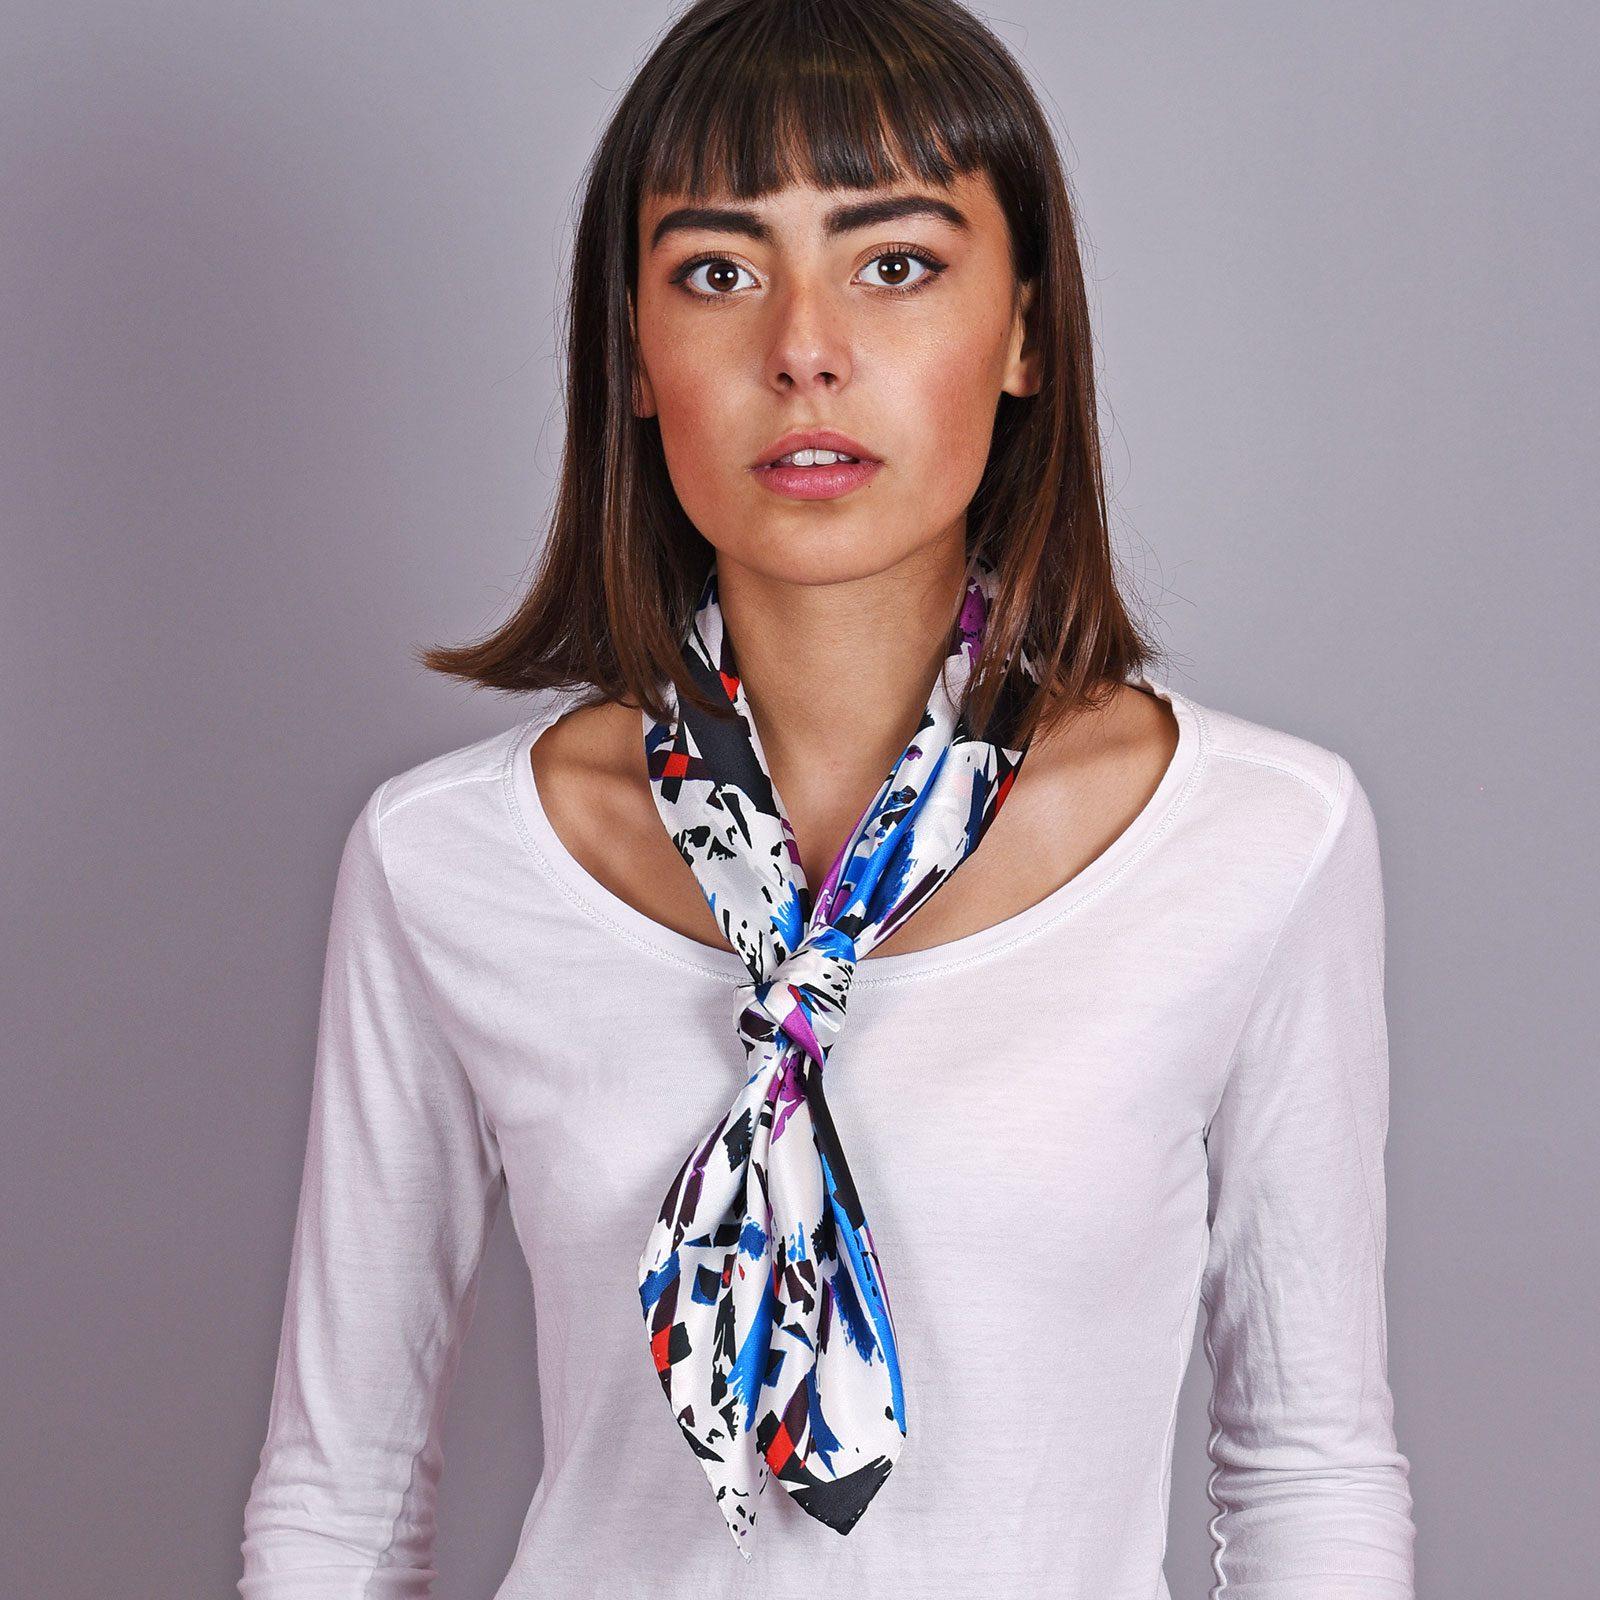 http://lookbook.allee-du-foulard.fr/wp-content/uploads/2018/12/AT-04605-VF16-2-carre-en-soie-blanc-abstrait-65x65-made-in-italie-1600x1600.jpg